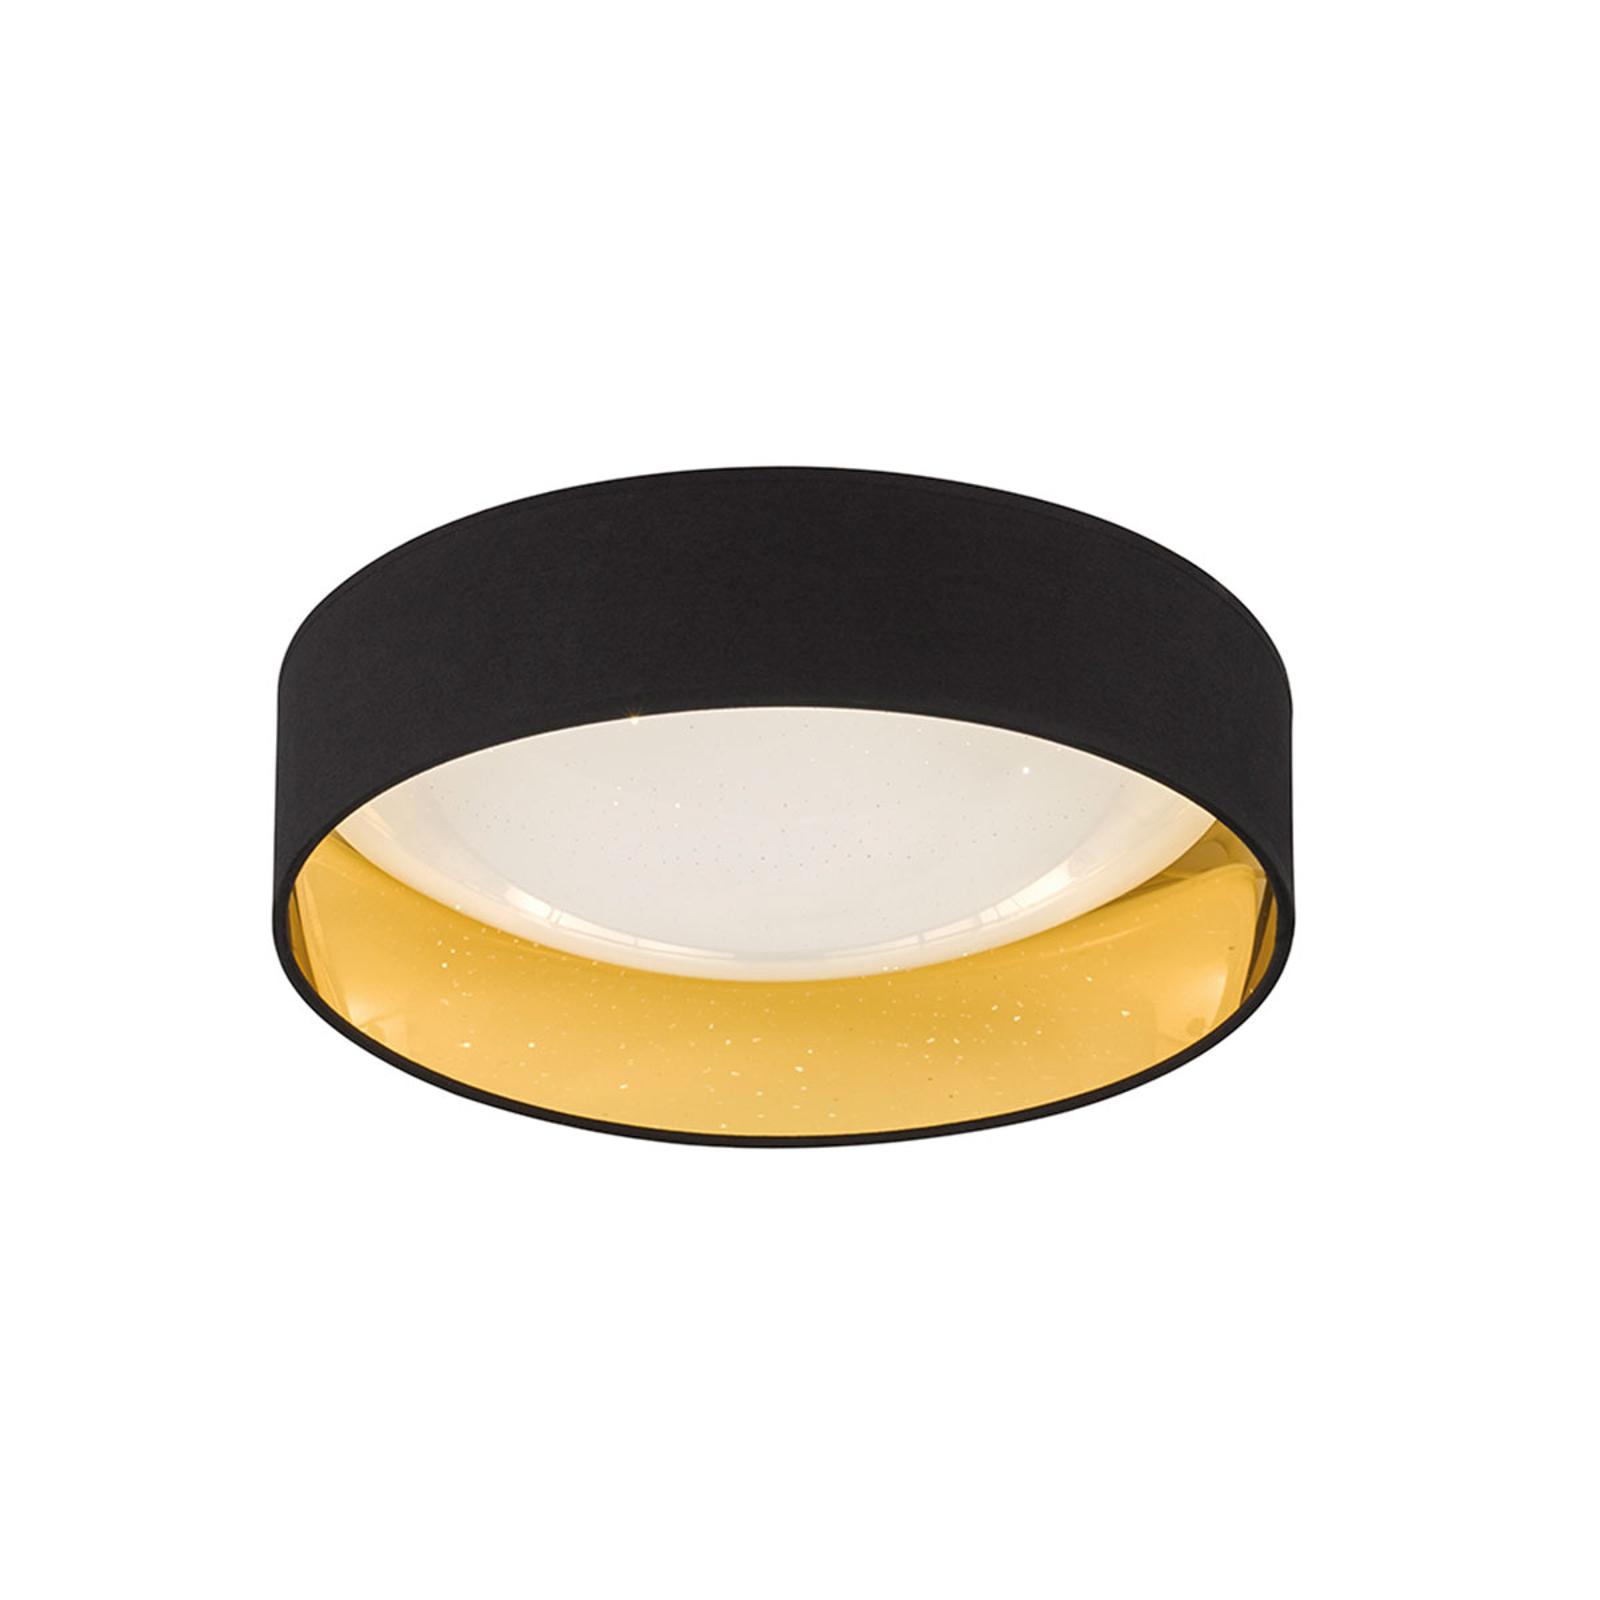 Zwart gouden LED plafondlamp Sete Ø 40 cm